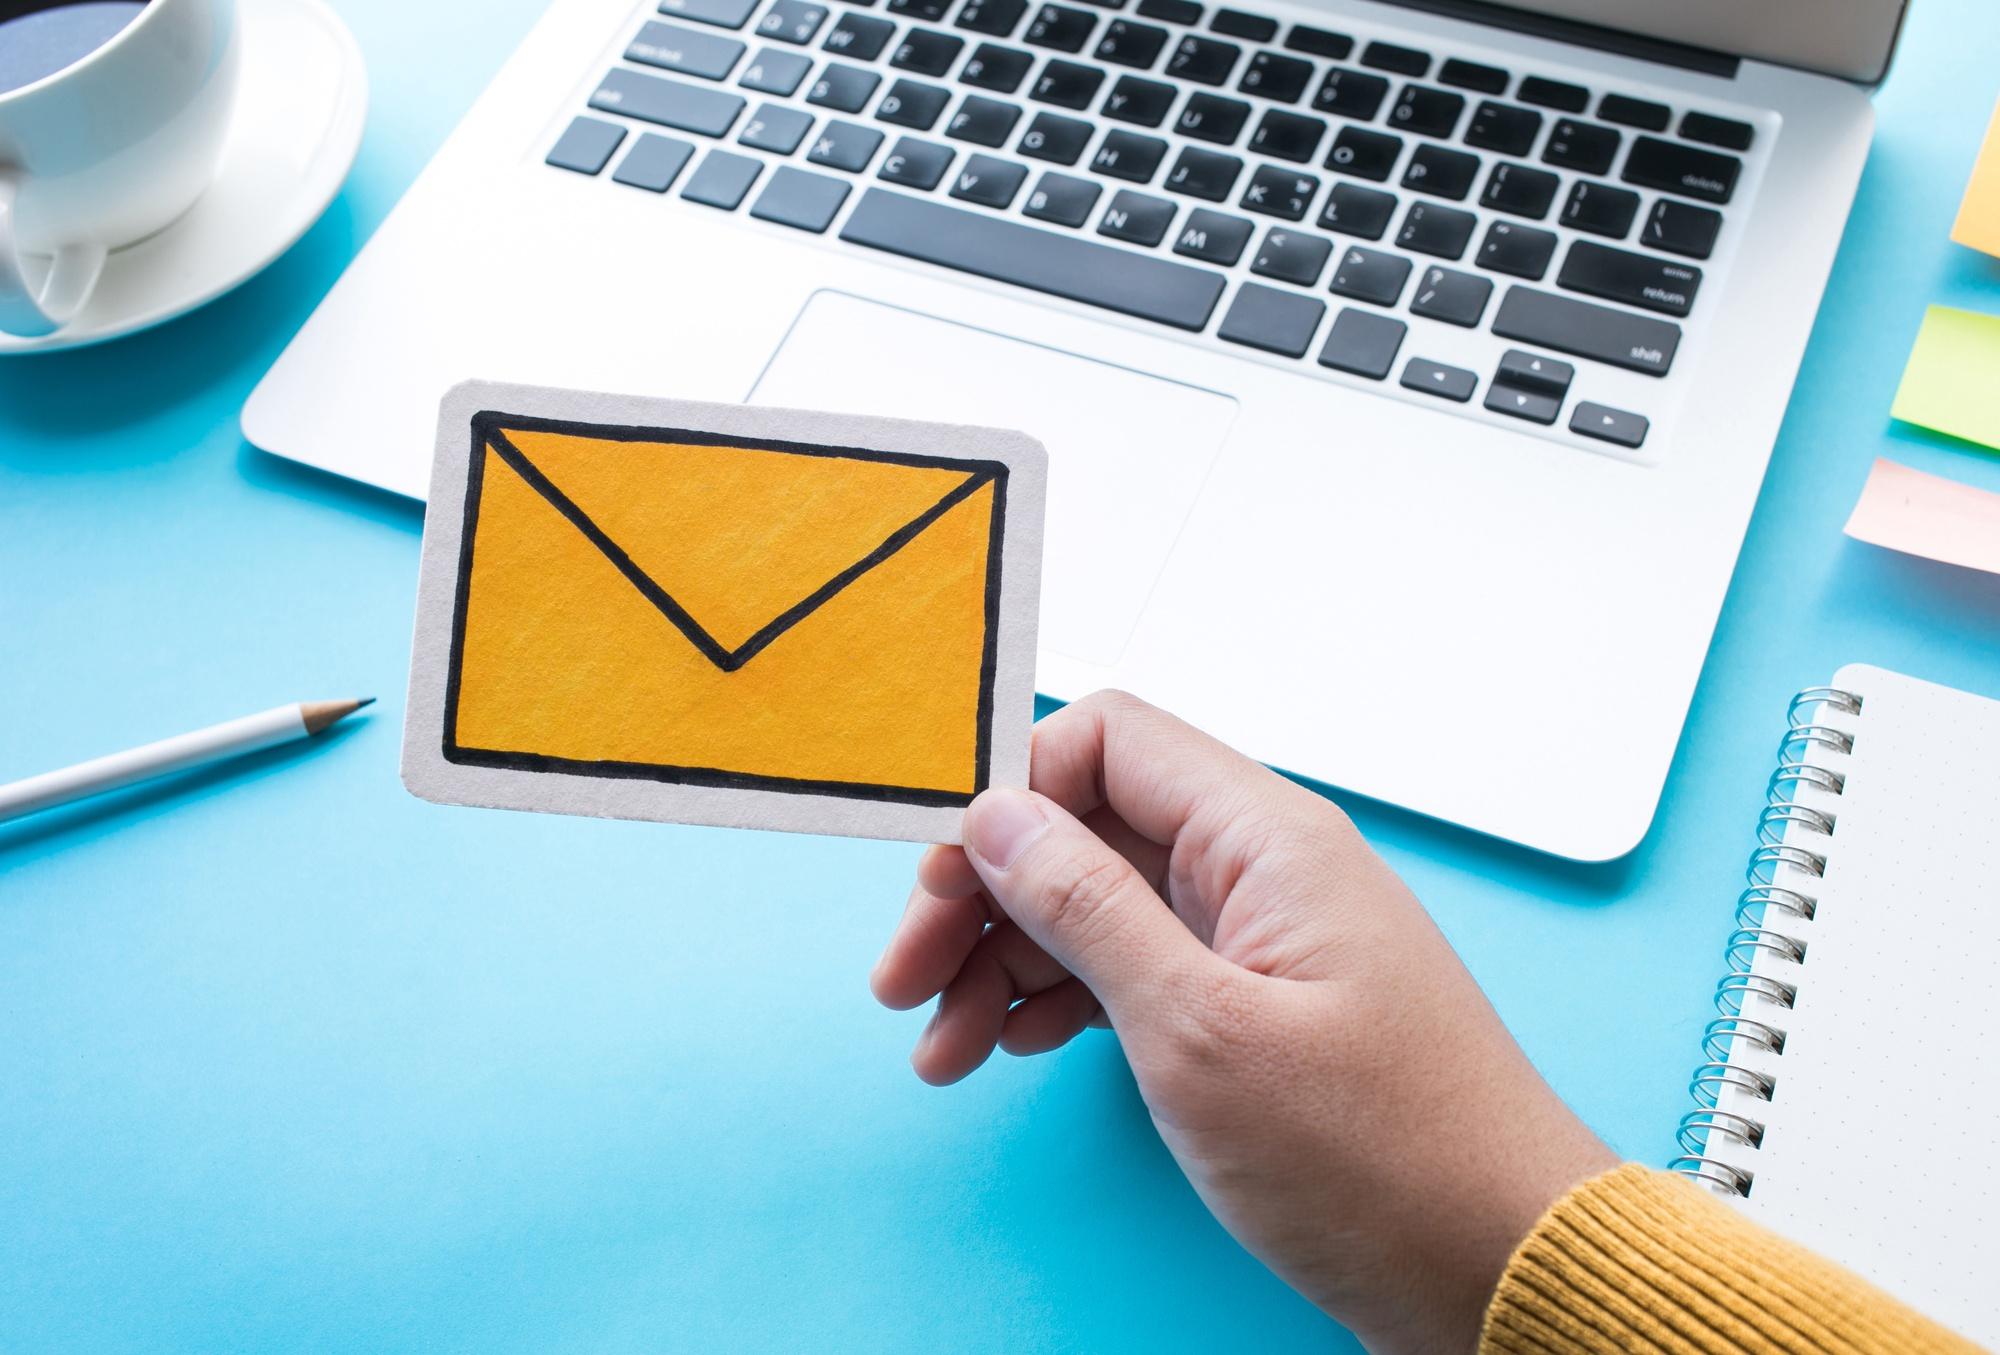 Logra  la excelencia a través de tus newsletters